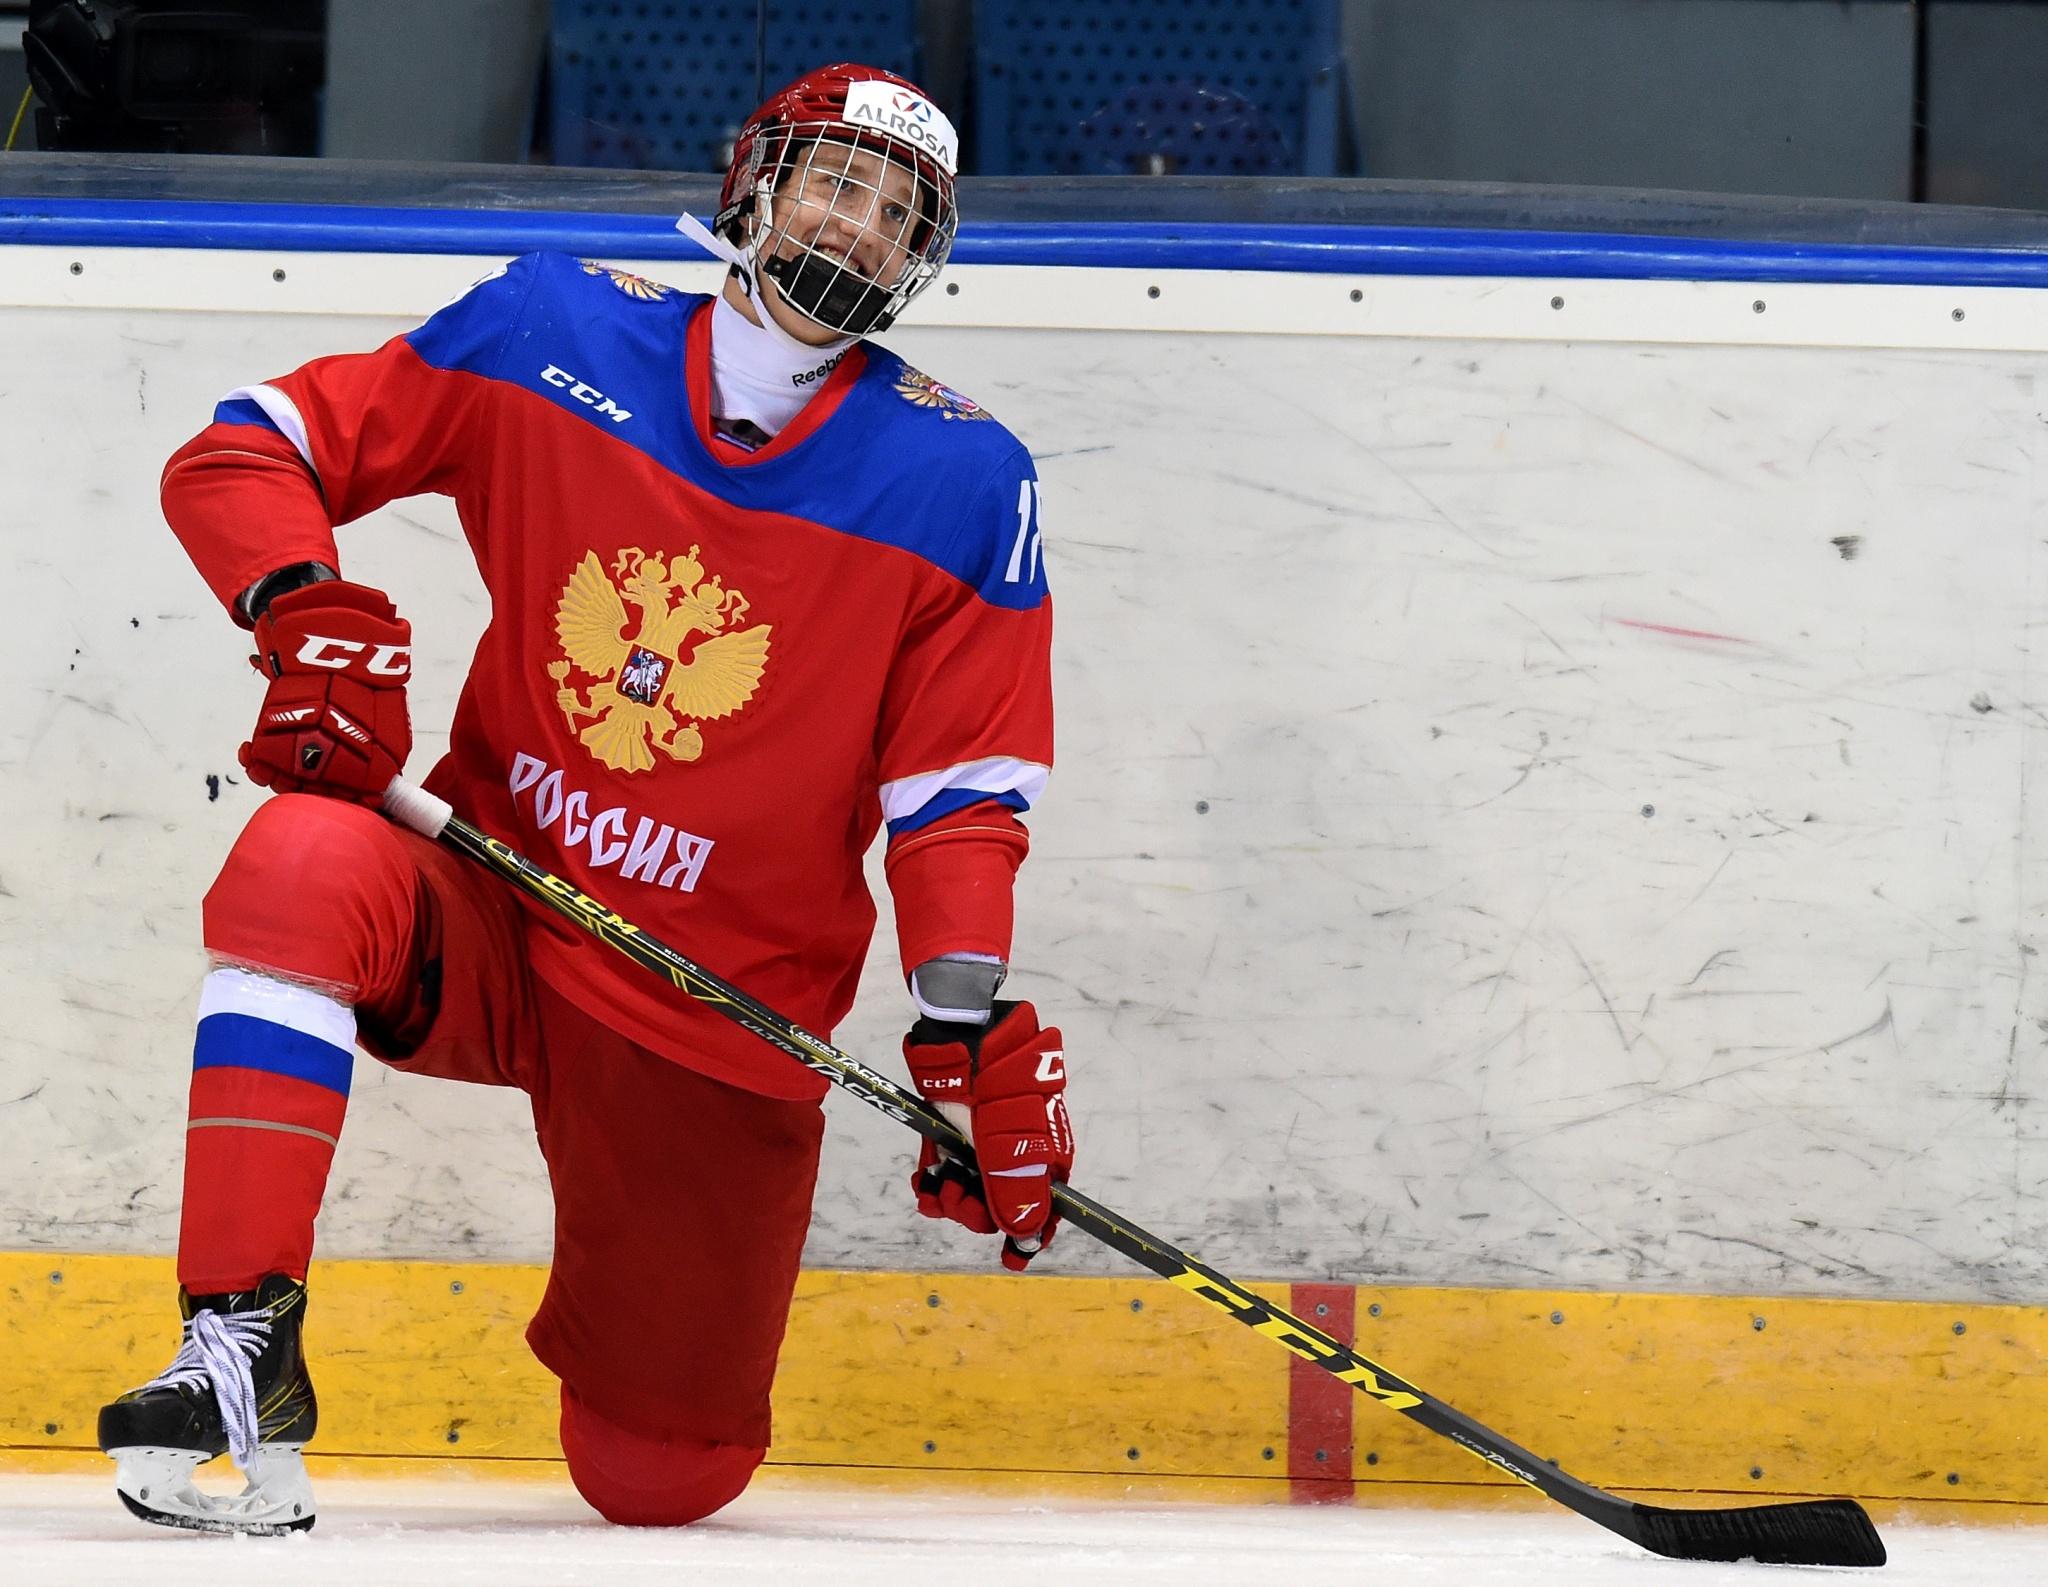 Дмитрий Саморуков. Фото: Юрий Кузьмин